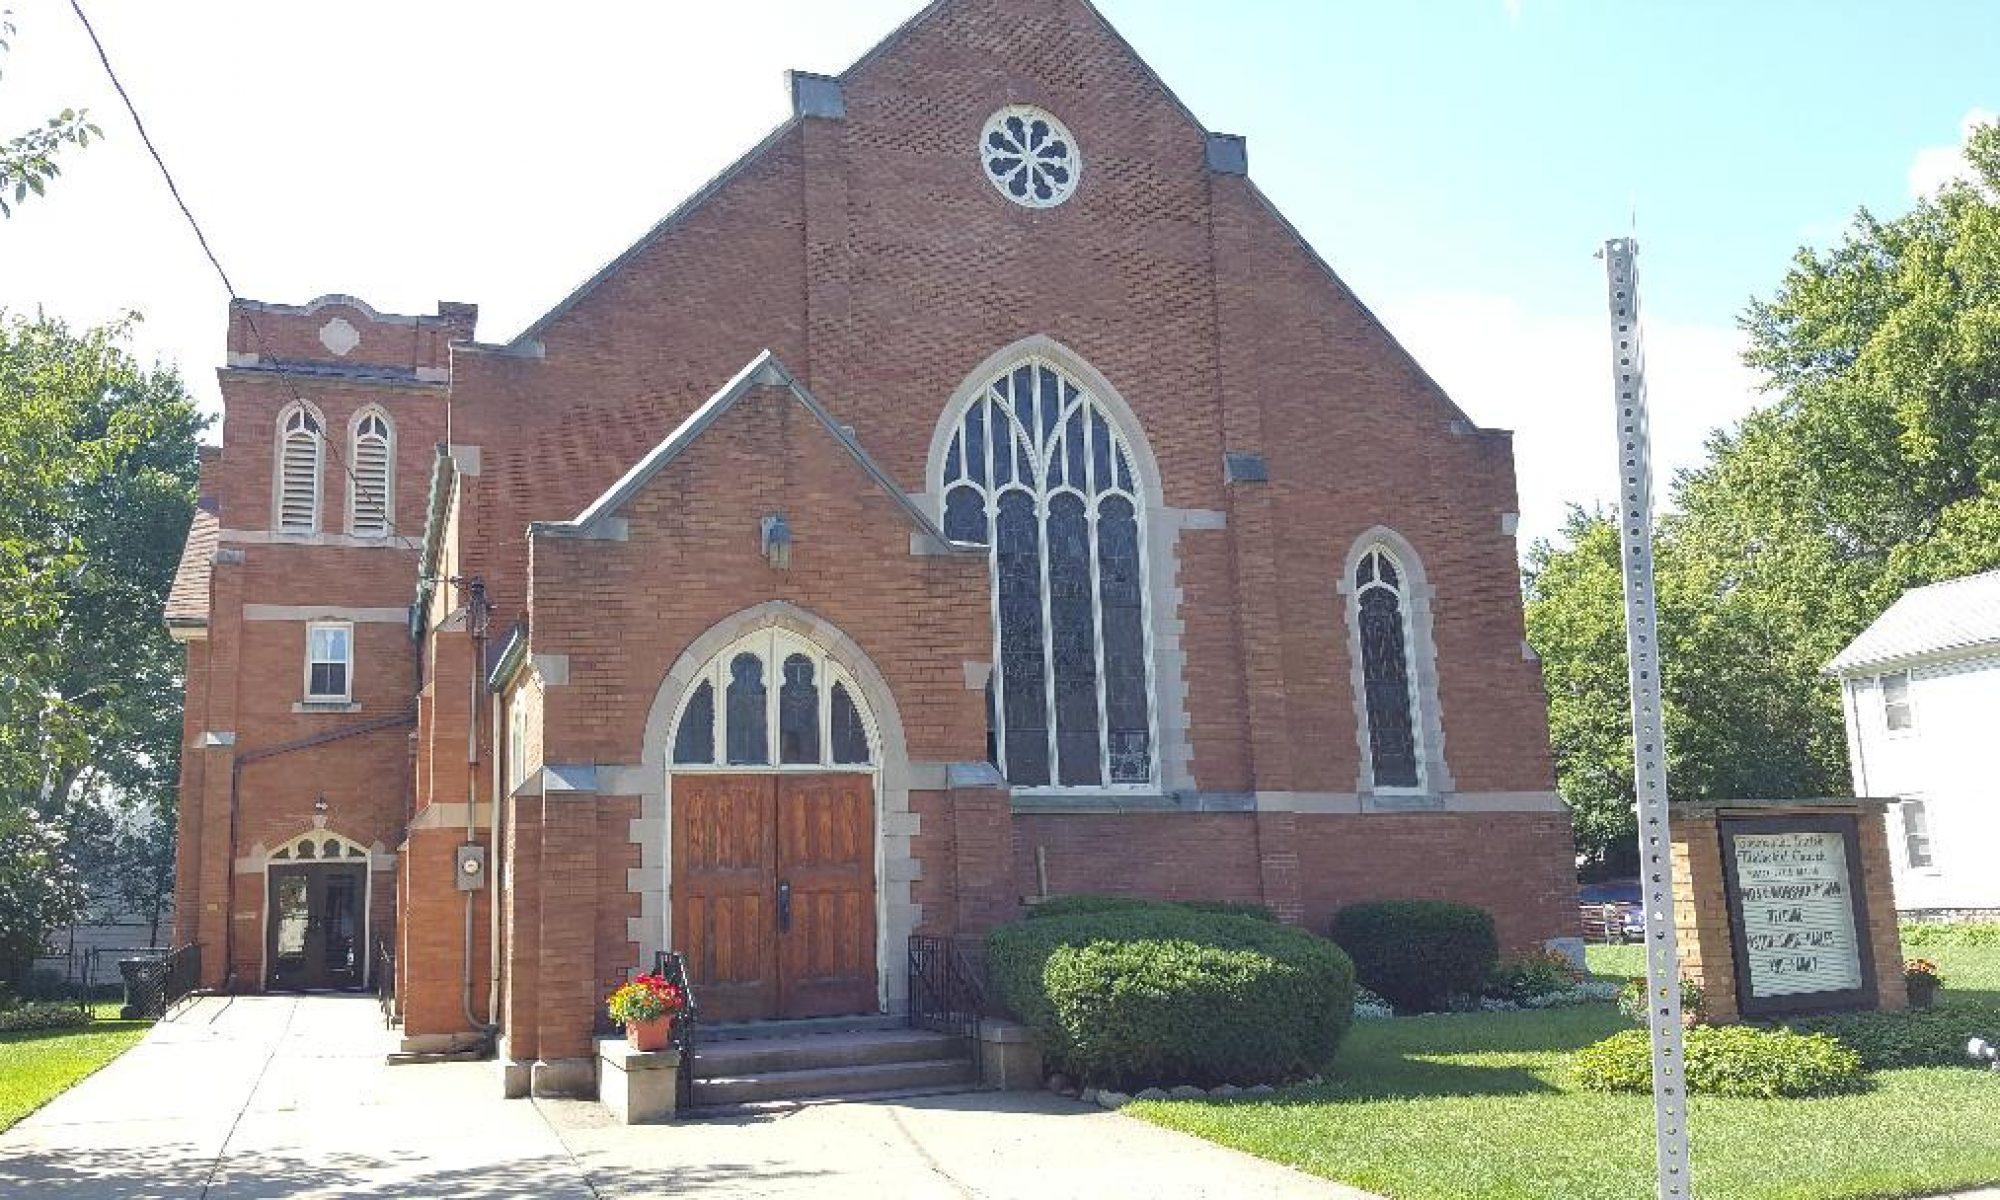 Tonawanda United Methodist Church